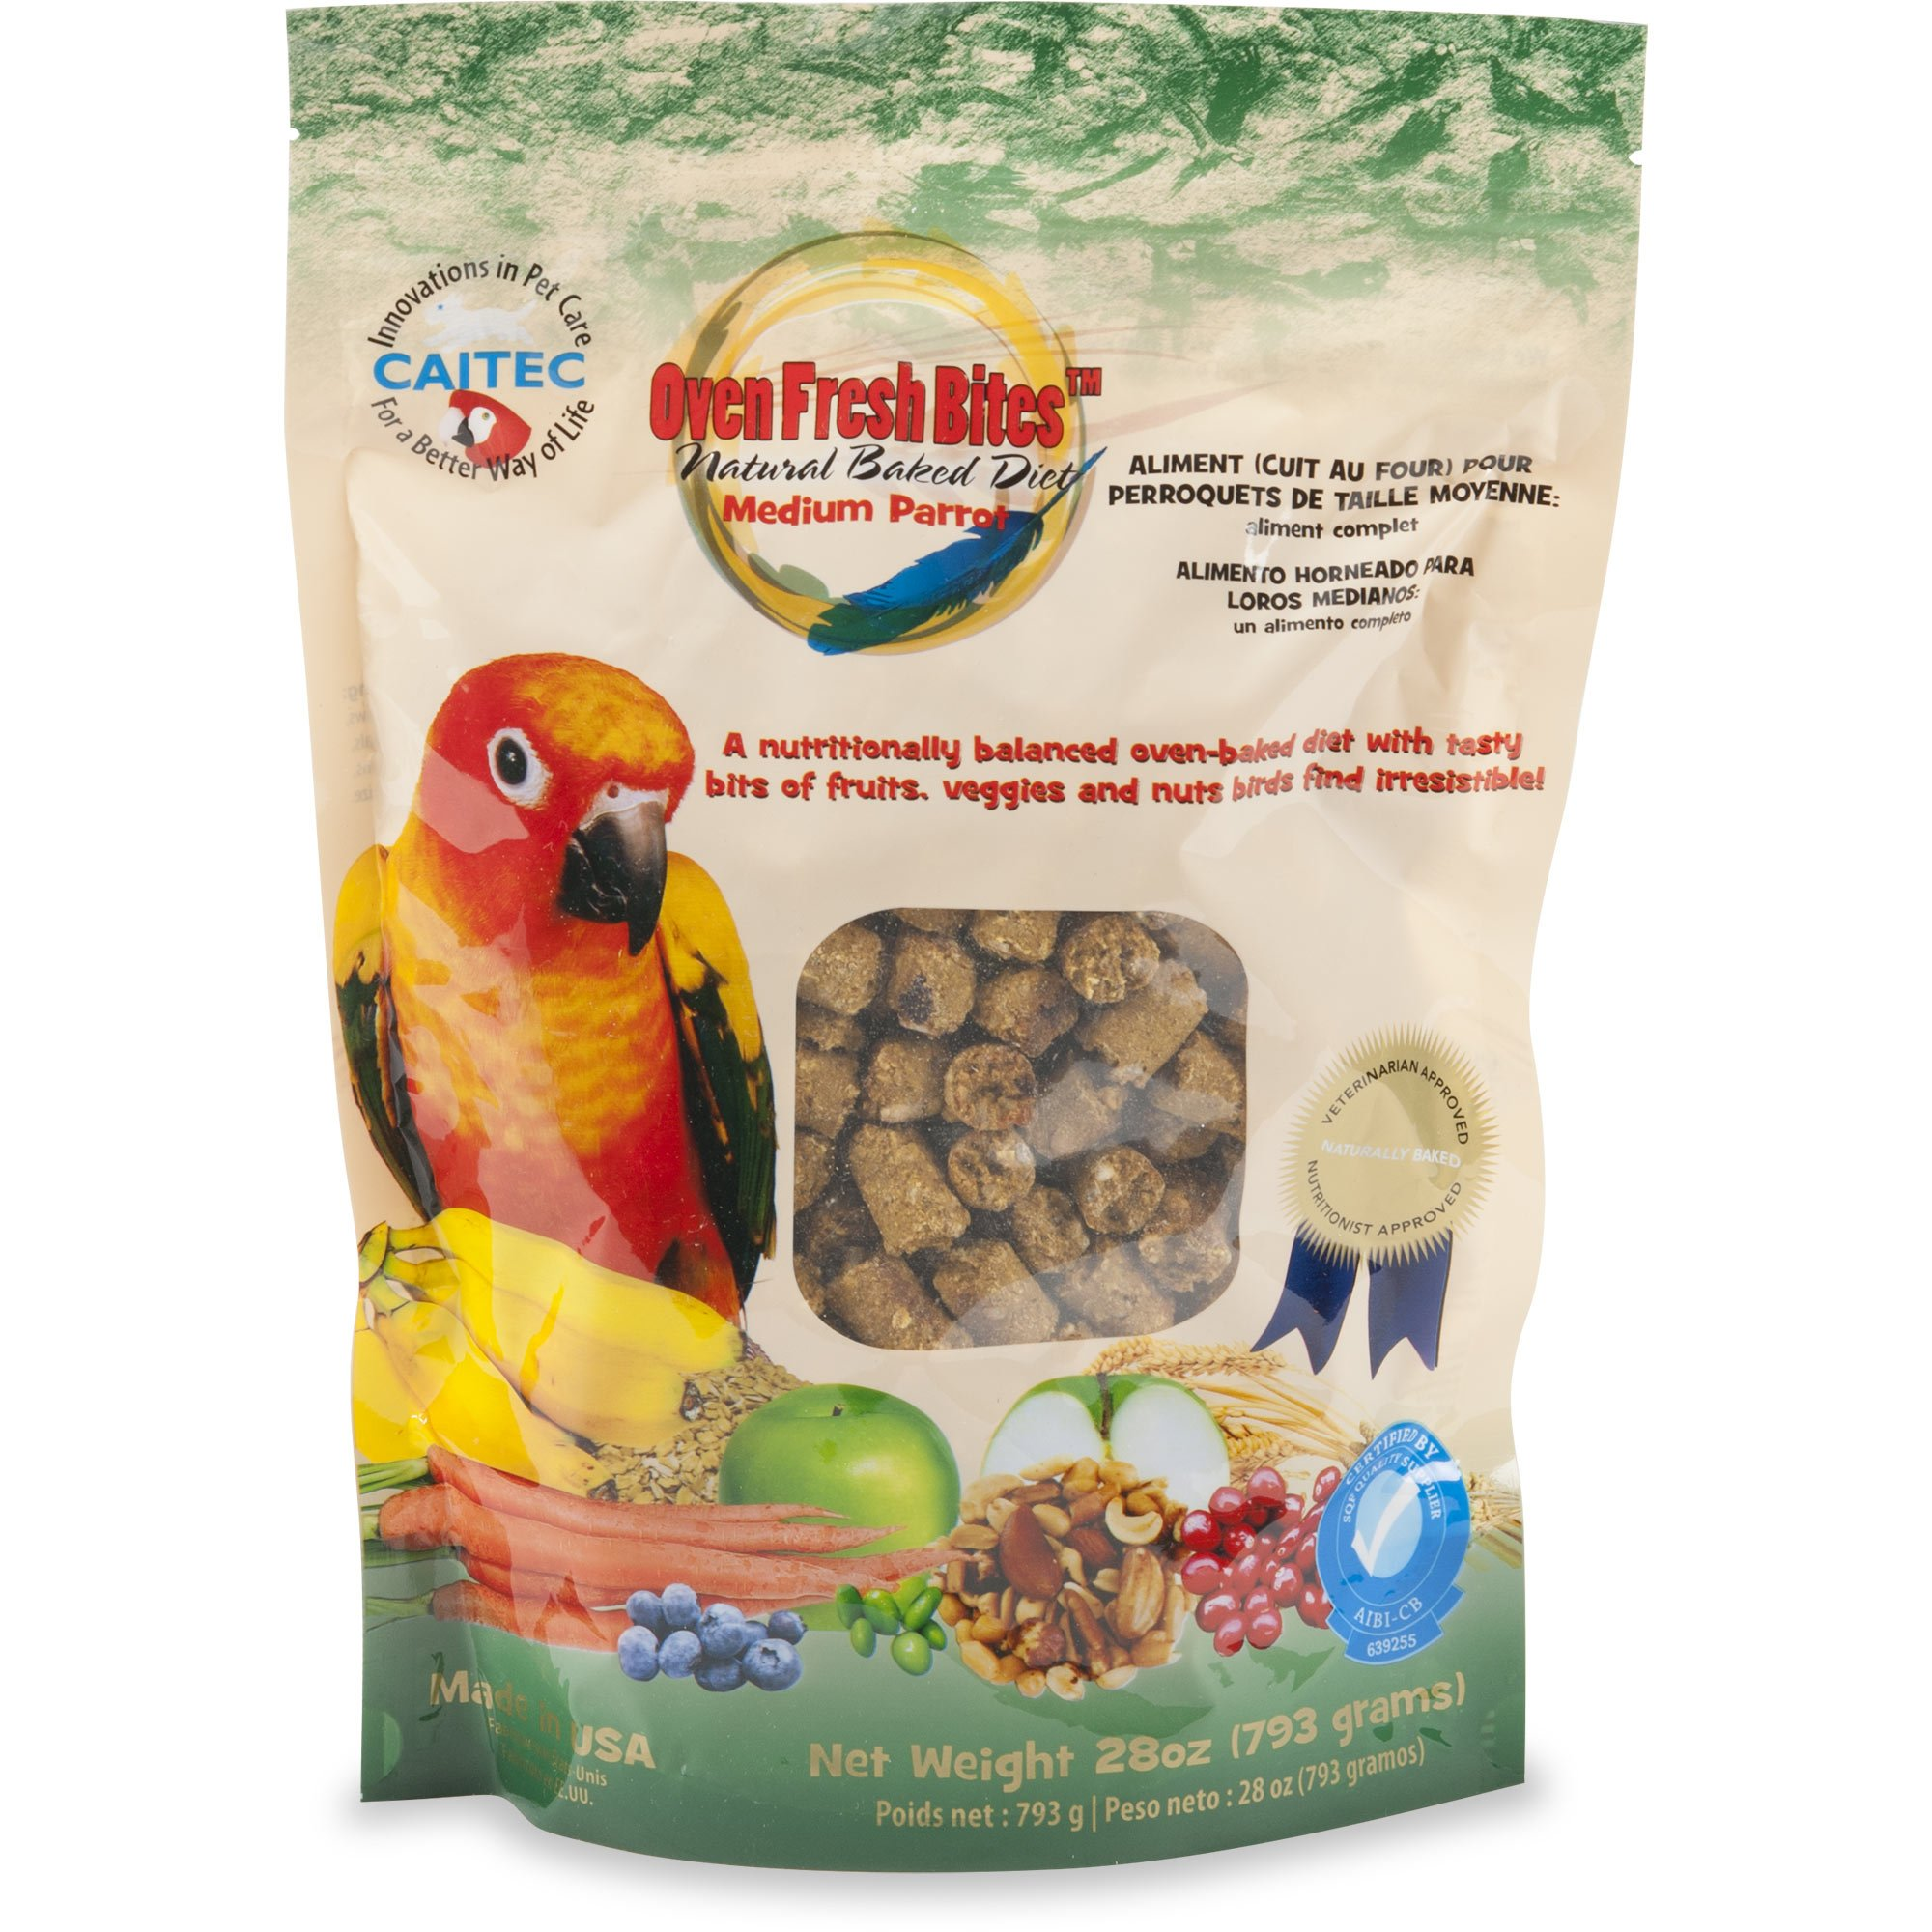 Caitec Oven Fresh Bites Natural Baked Diet for Medium Parrots Bird Food    Petco